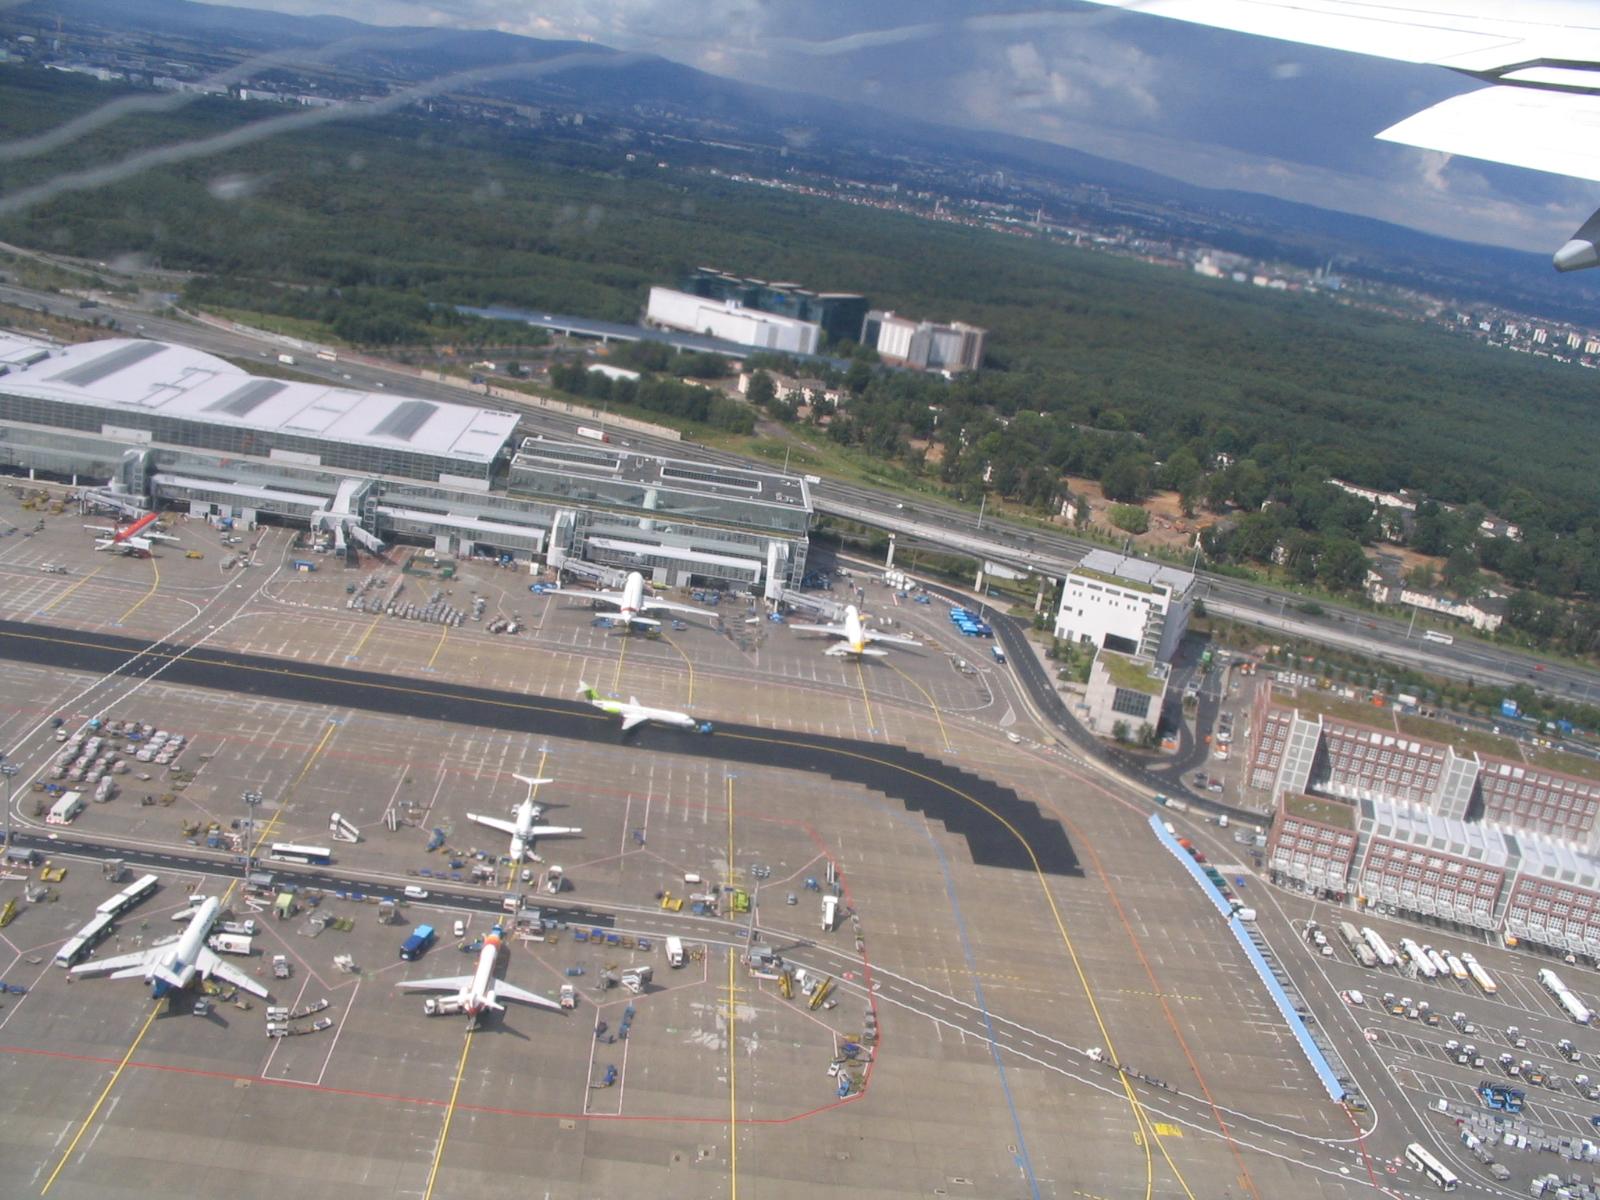 Flughafen Frankfurt Am Main Terminal 2